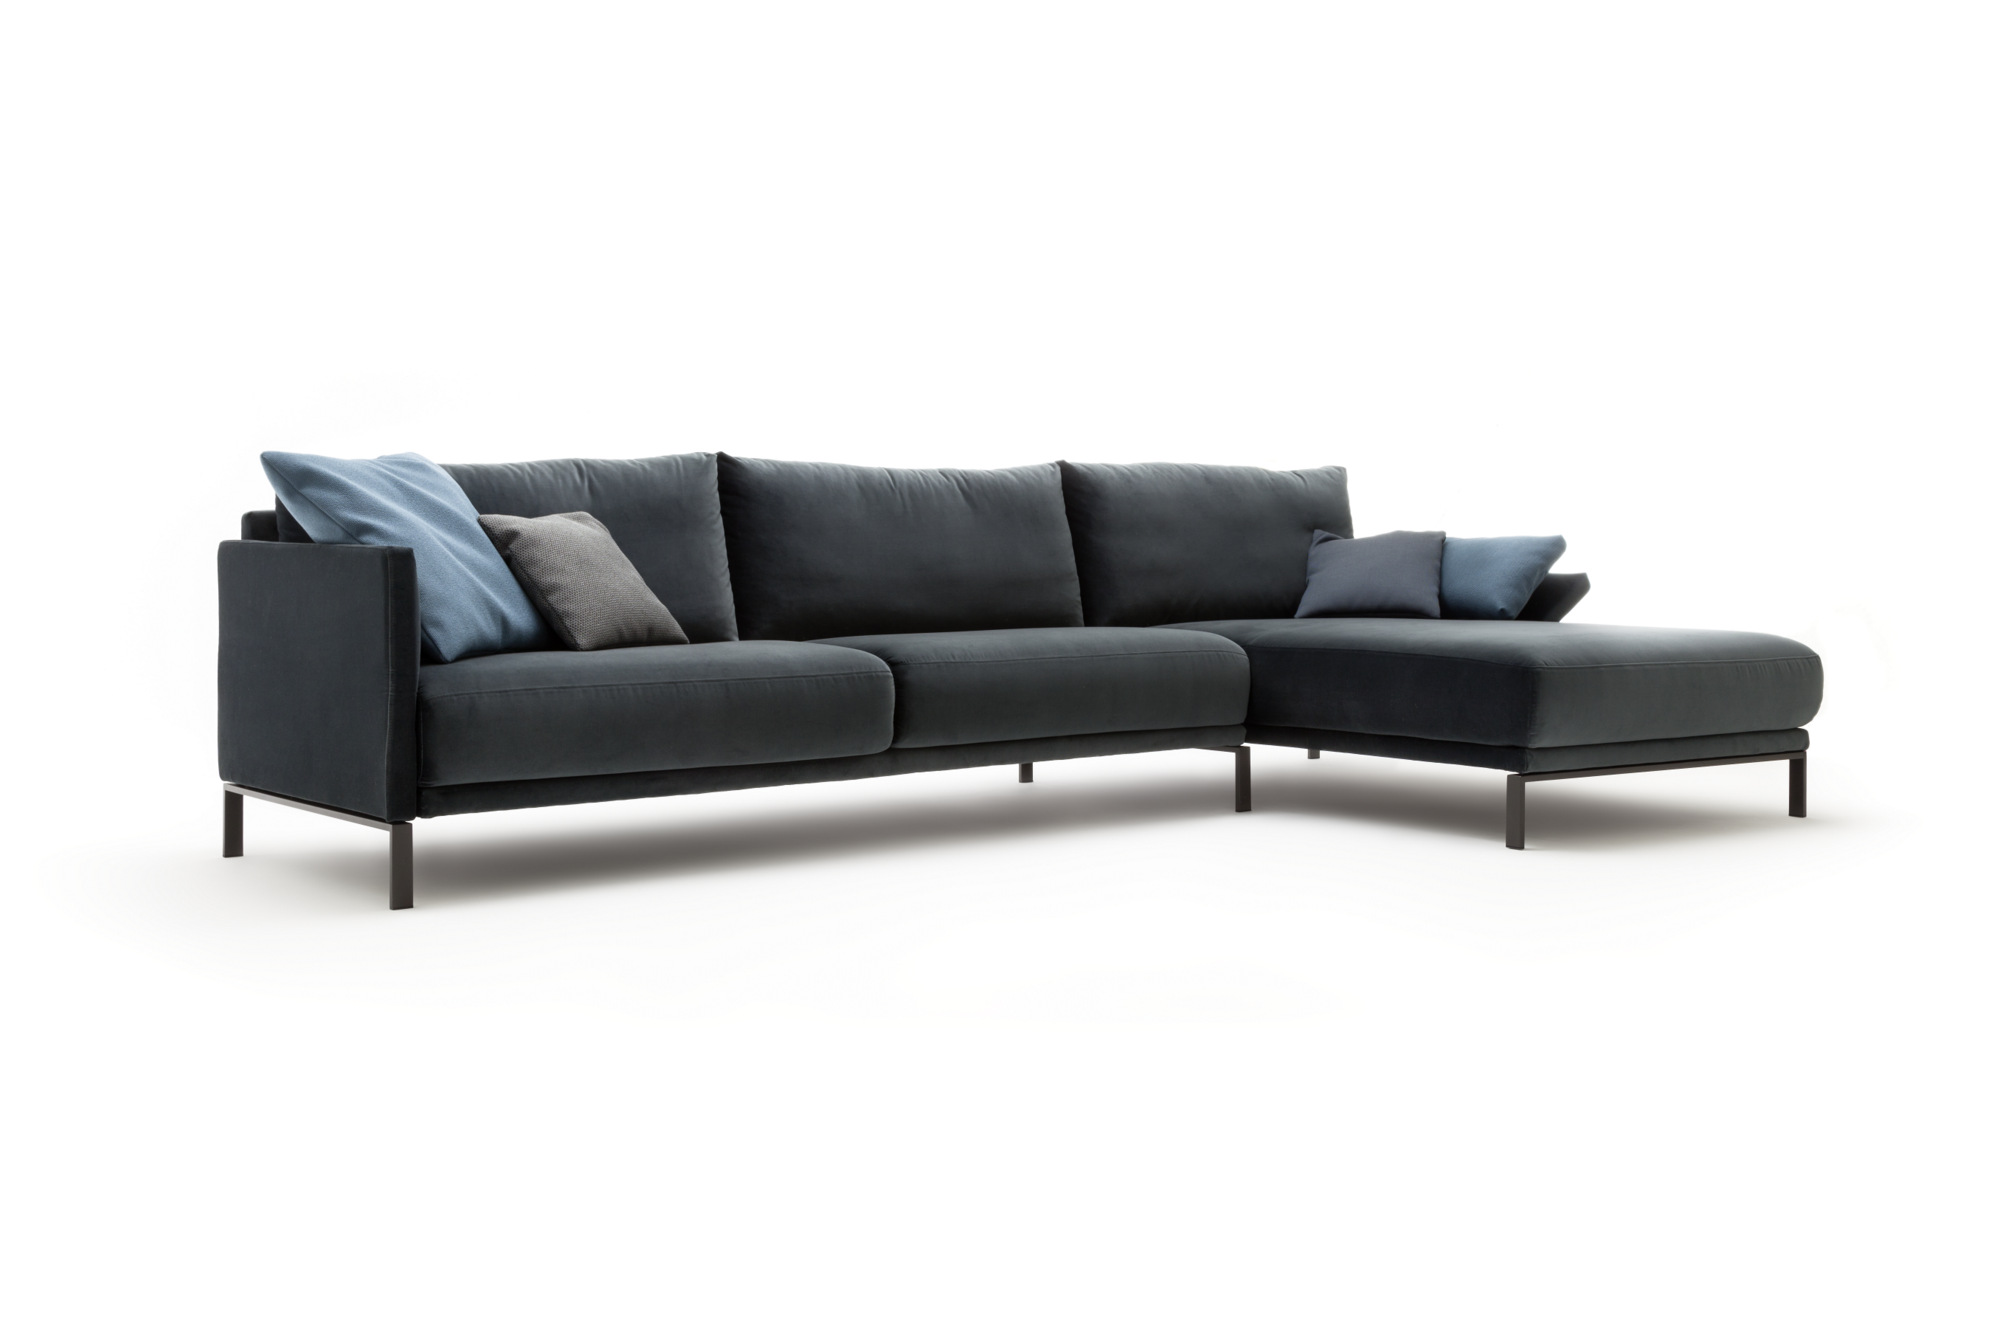 dono modular sofa rolf benz. Awesome Rolf Benz Sofa Kaufen Perfect Das Bild Wird With Dono Modular